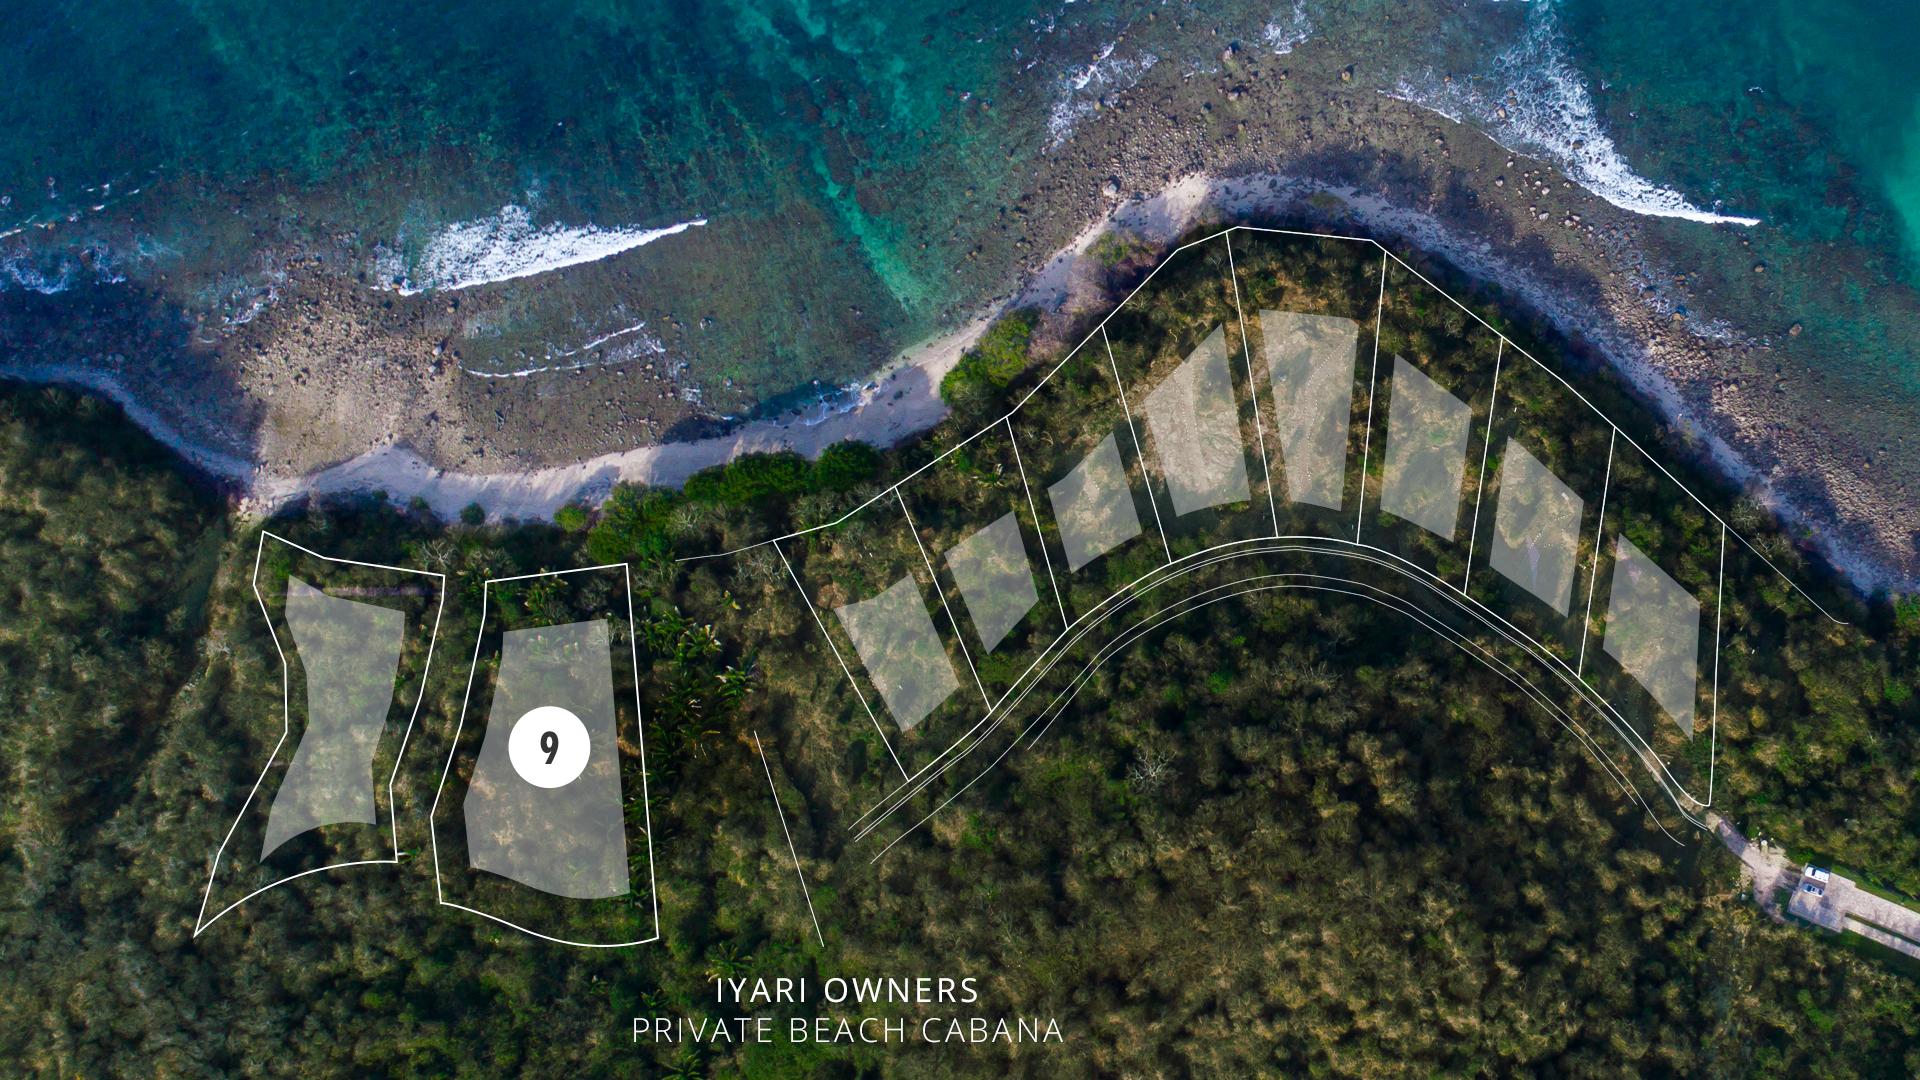 IYARI Signature Estates 9